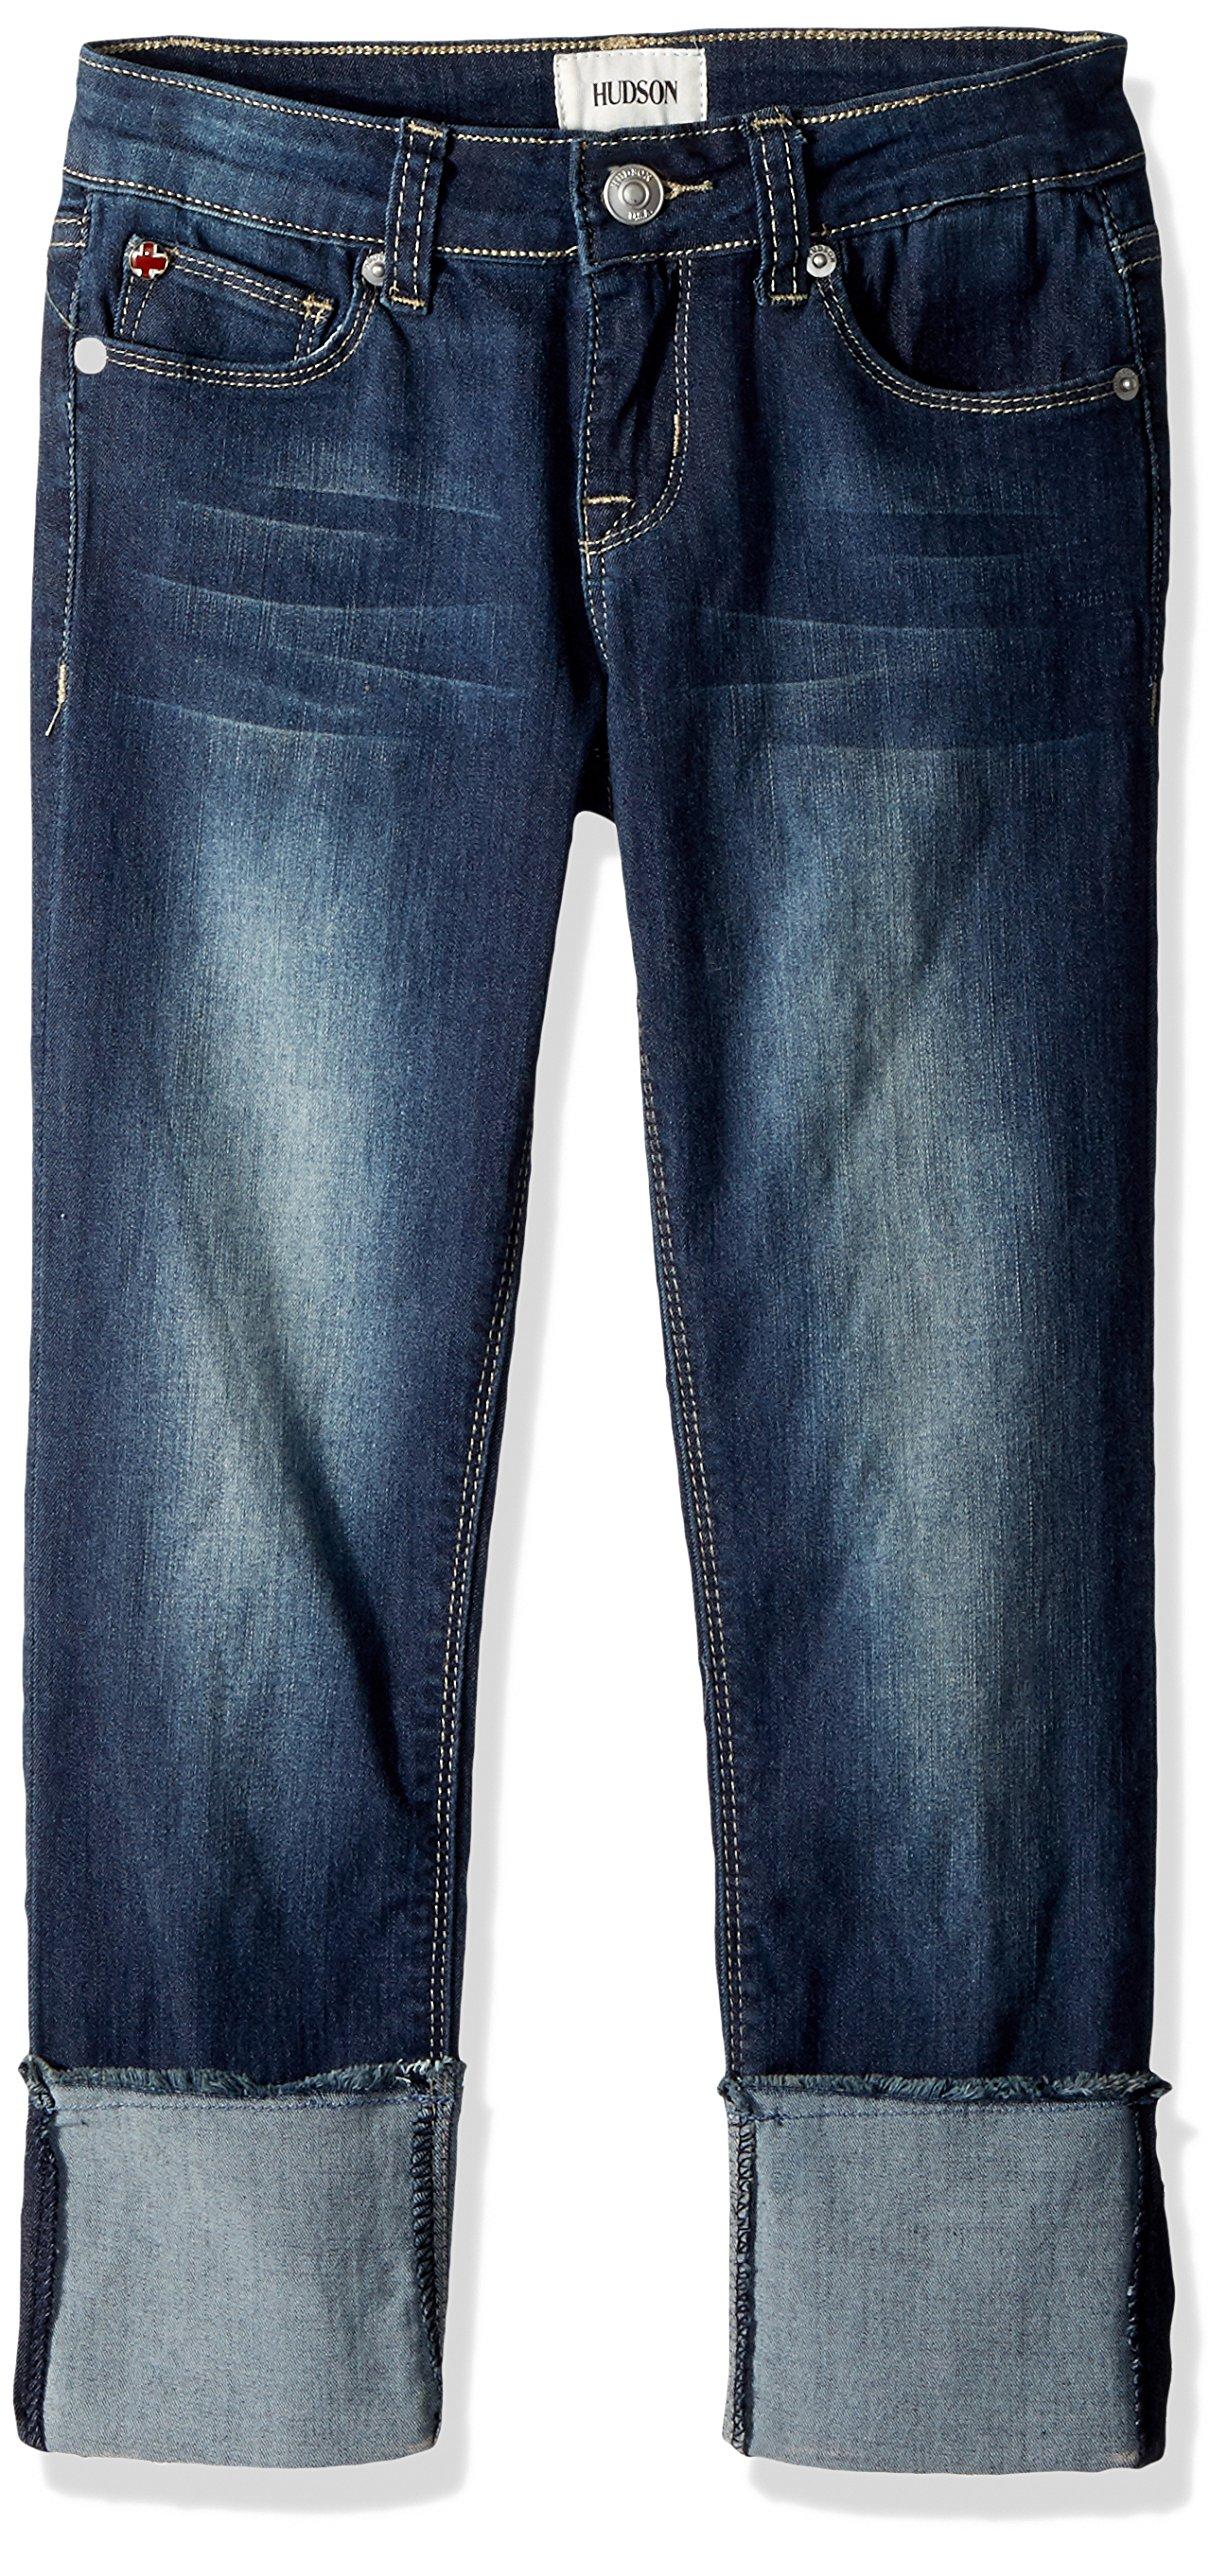 HUDSON Big Girls' Roll Cuff Crop Pant, Oxford Blue, 14 by HUDSON